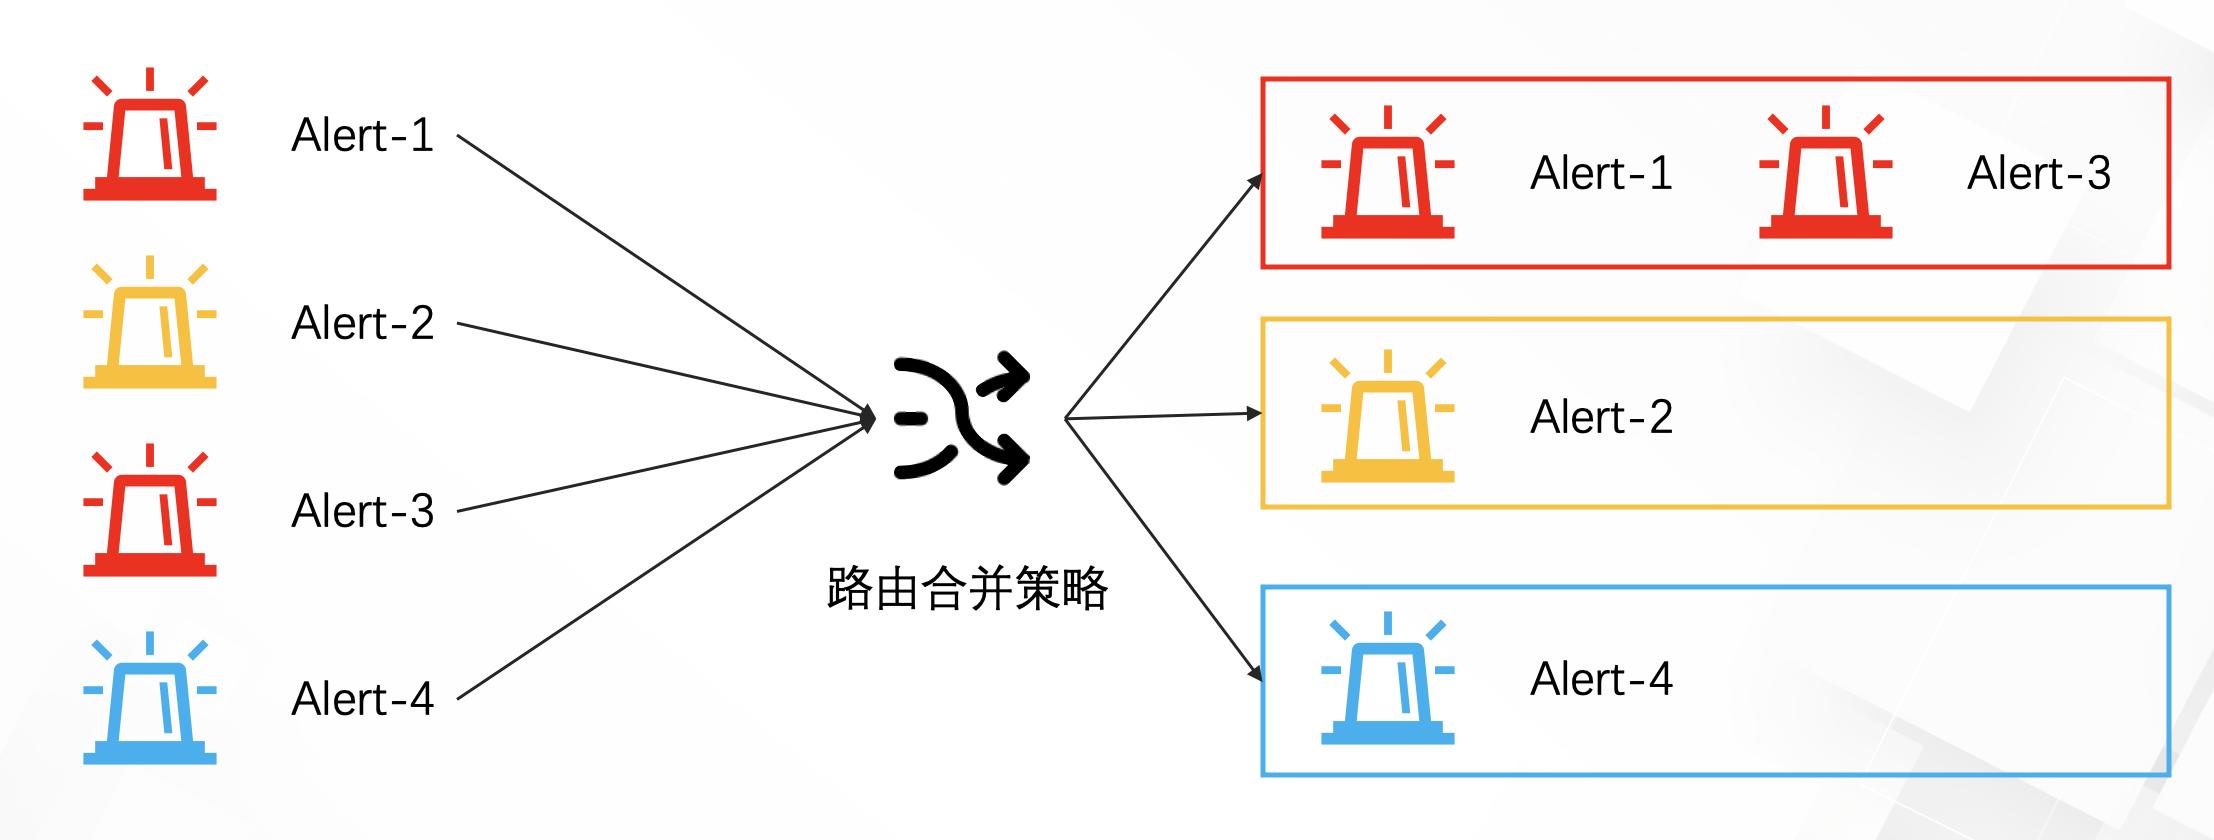 SLS新版本告警入门——告警策略-路由合并(1)